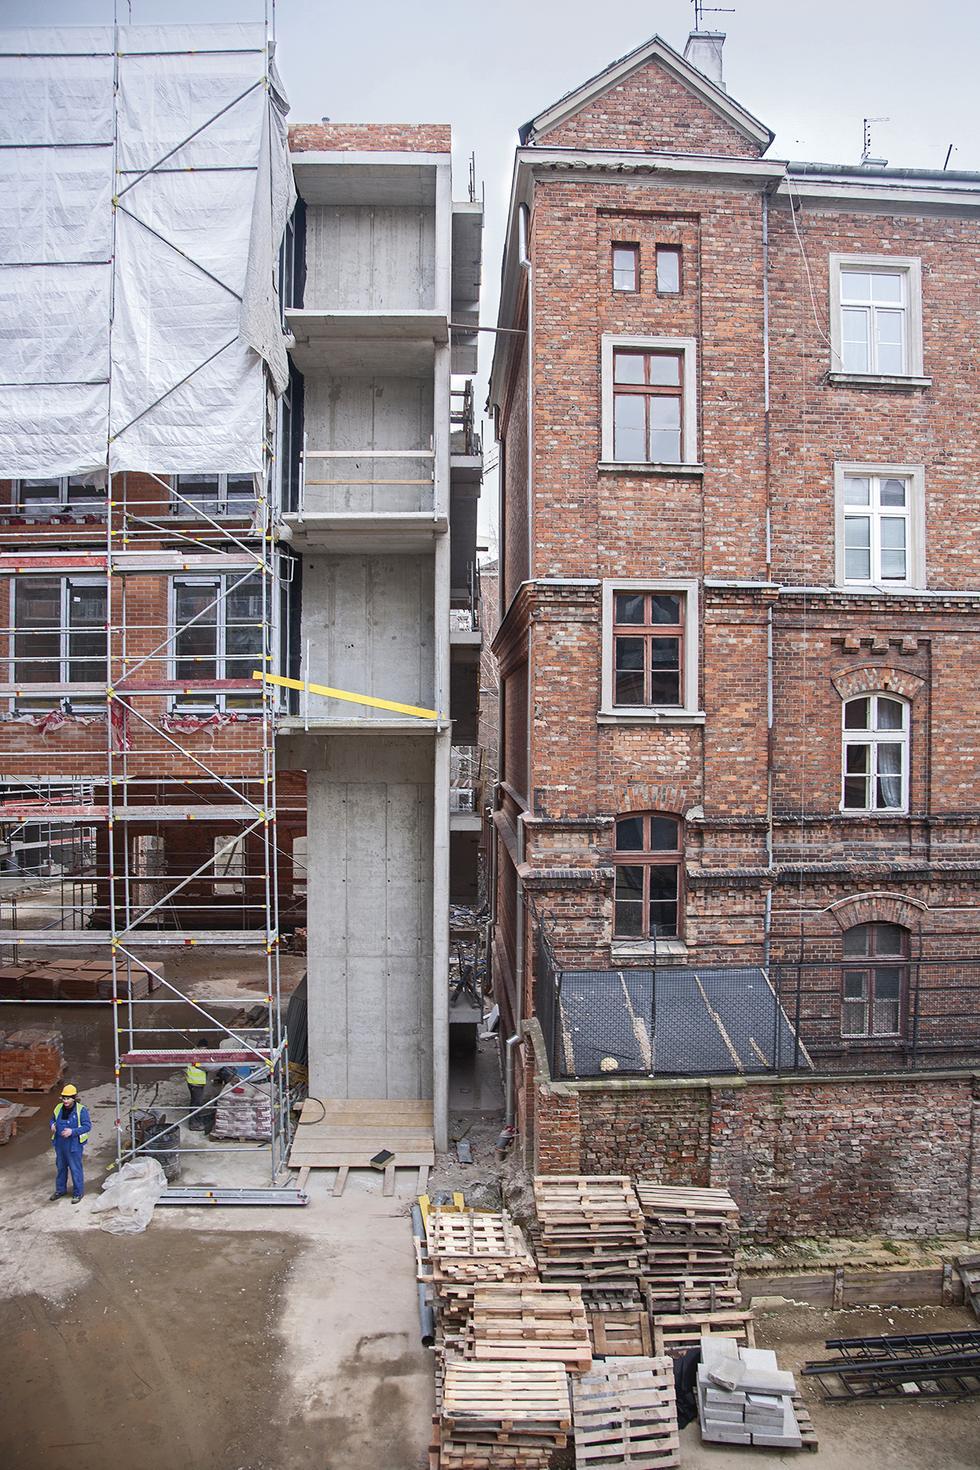 Apartamentowiec Skarbnica w Koneserze